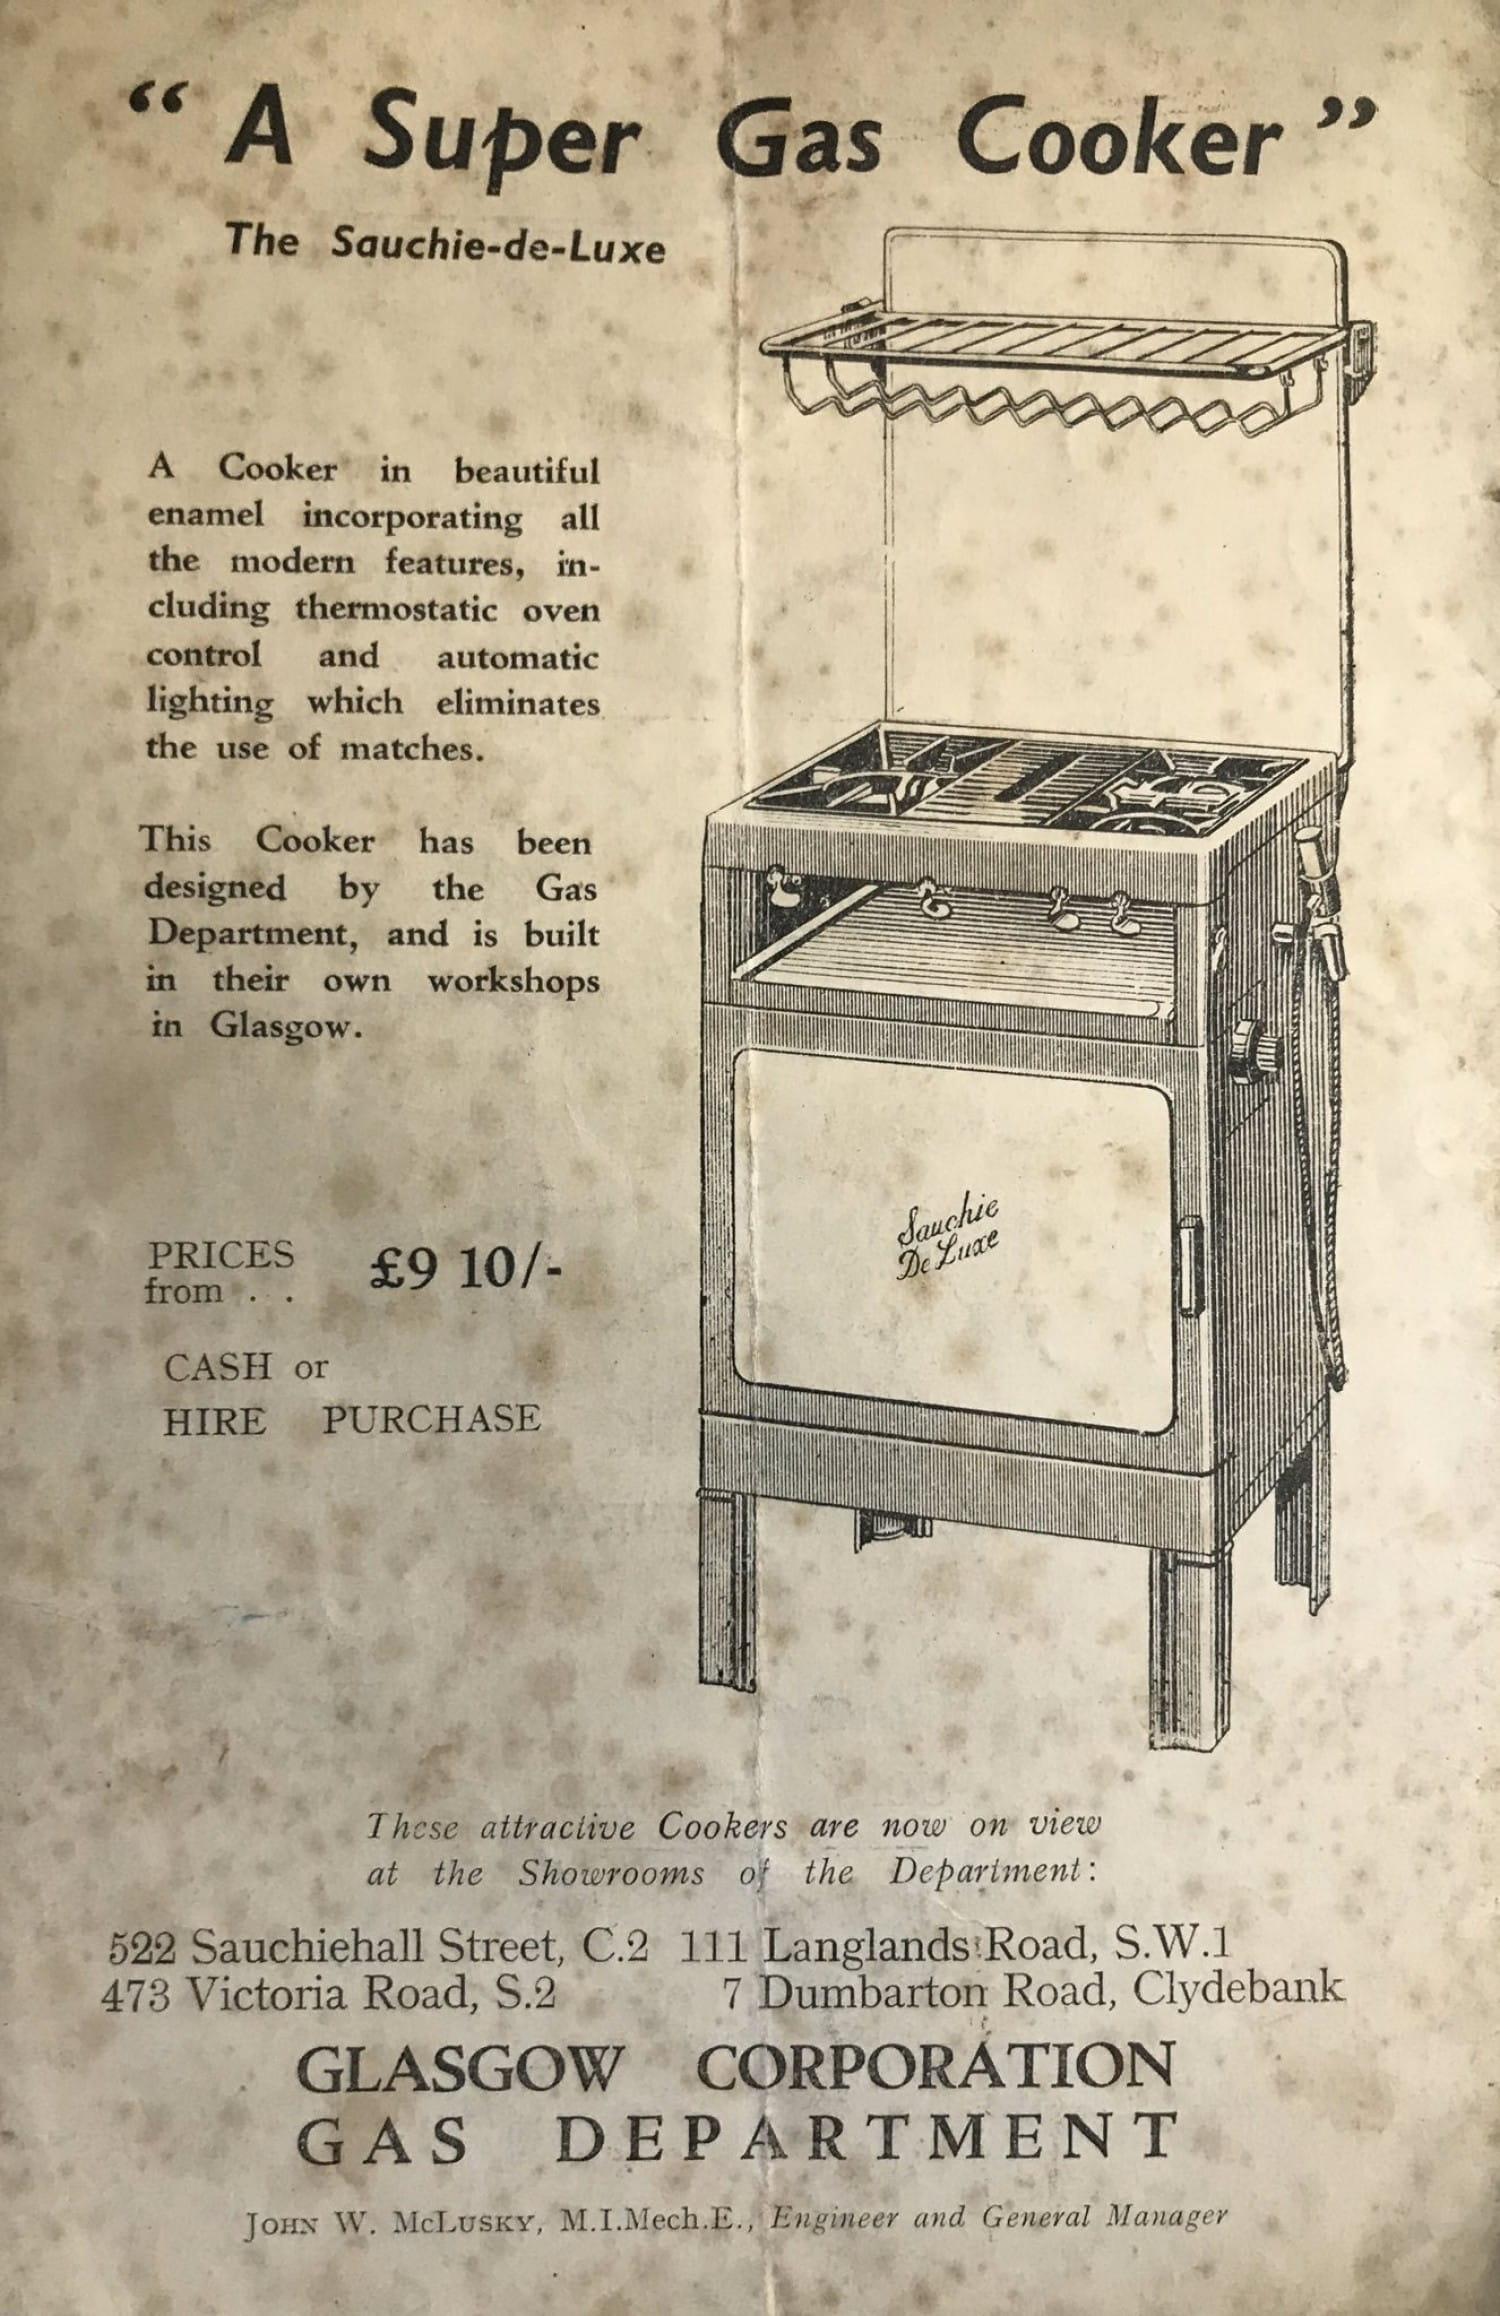 An advert for the 'Sauchie De Luxe' gas cooker.